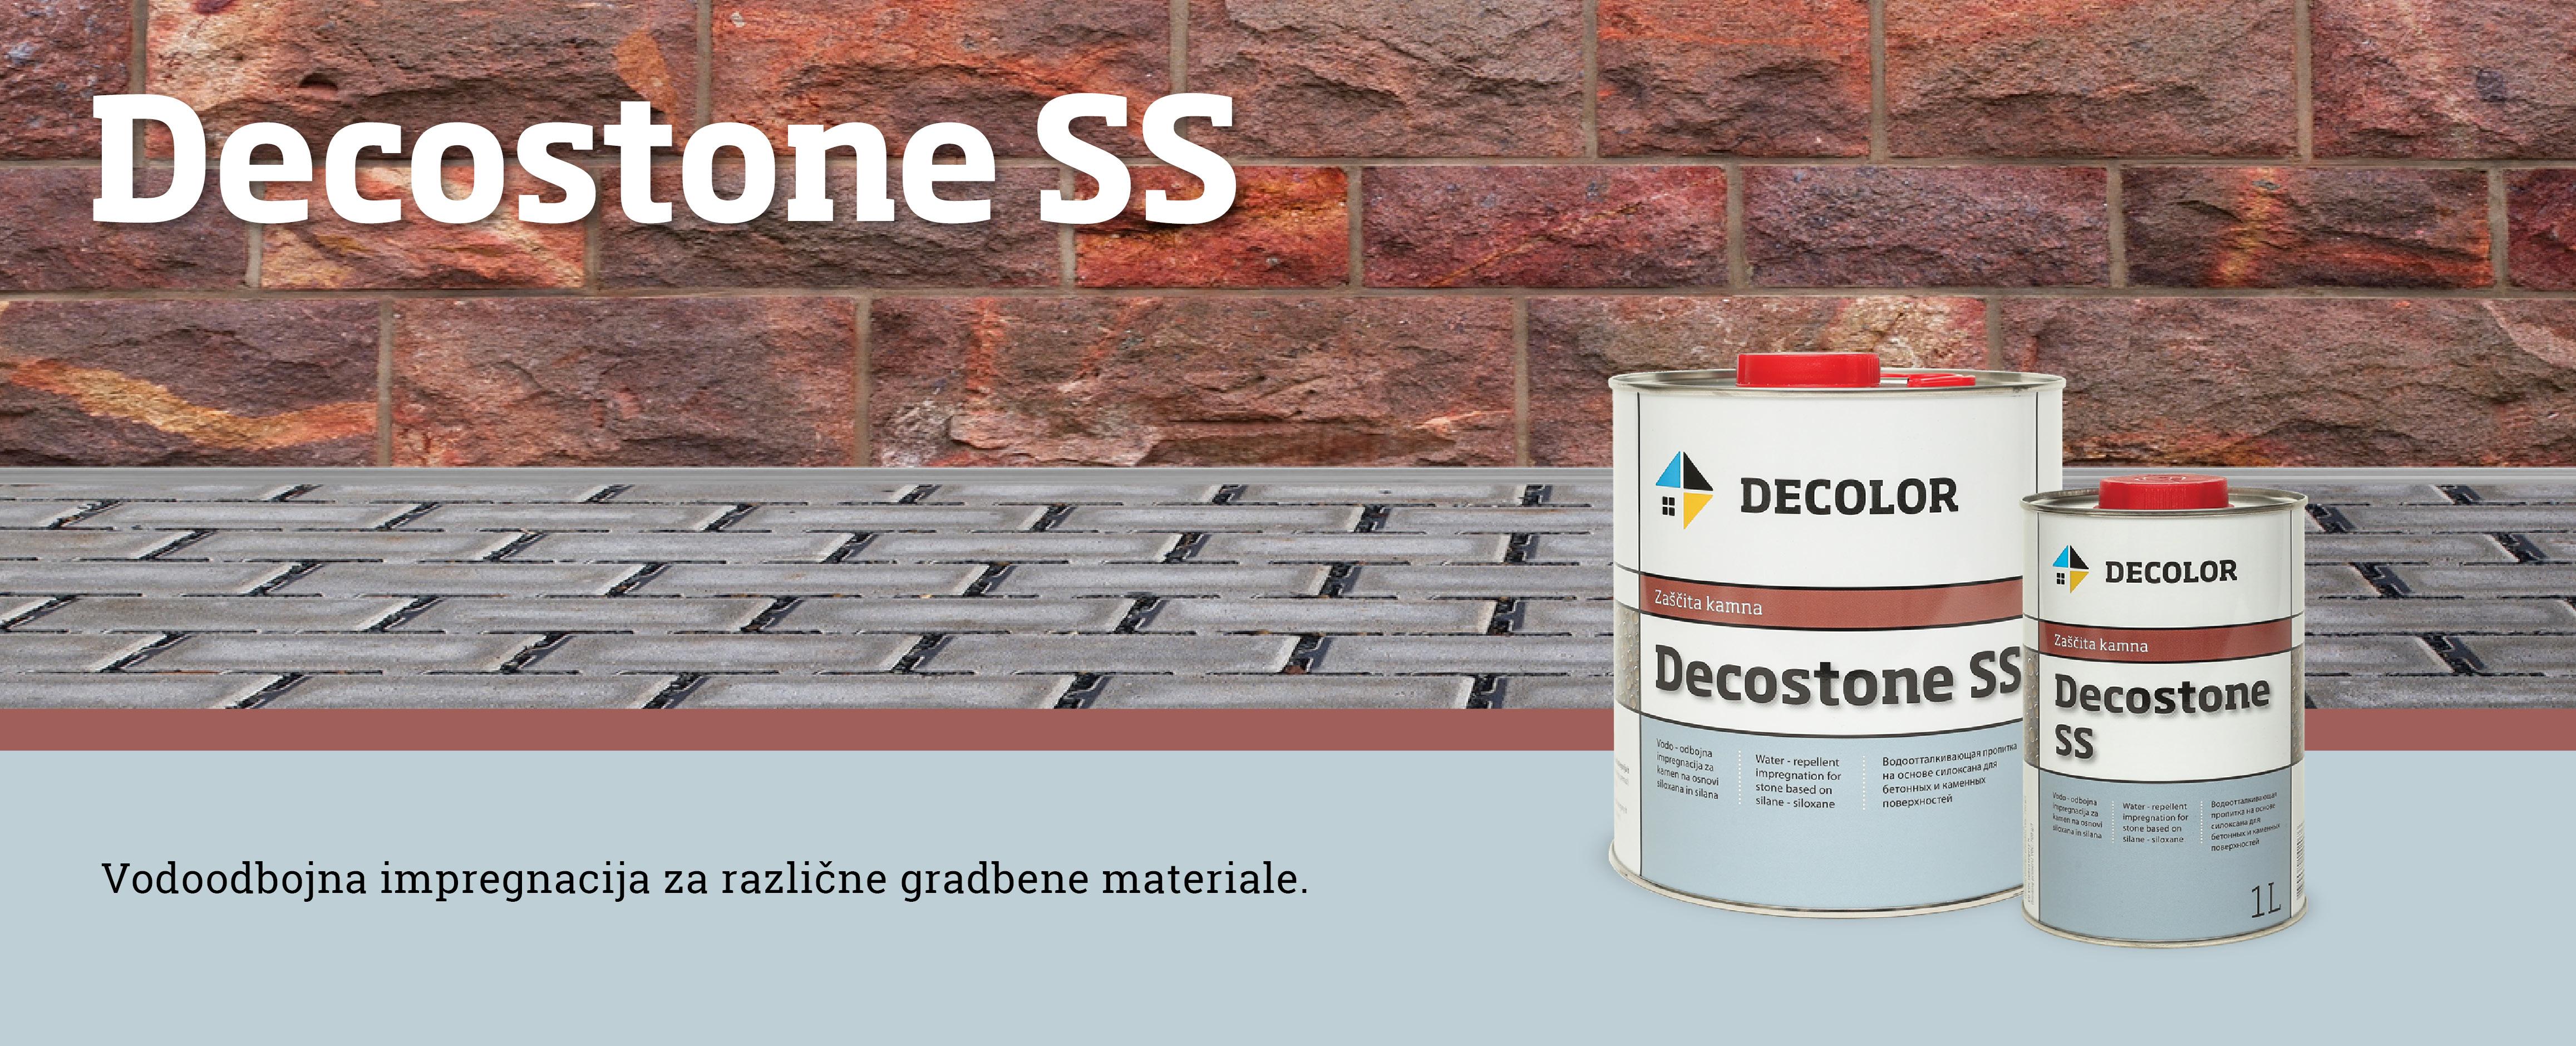 DecostoneSS3